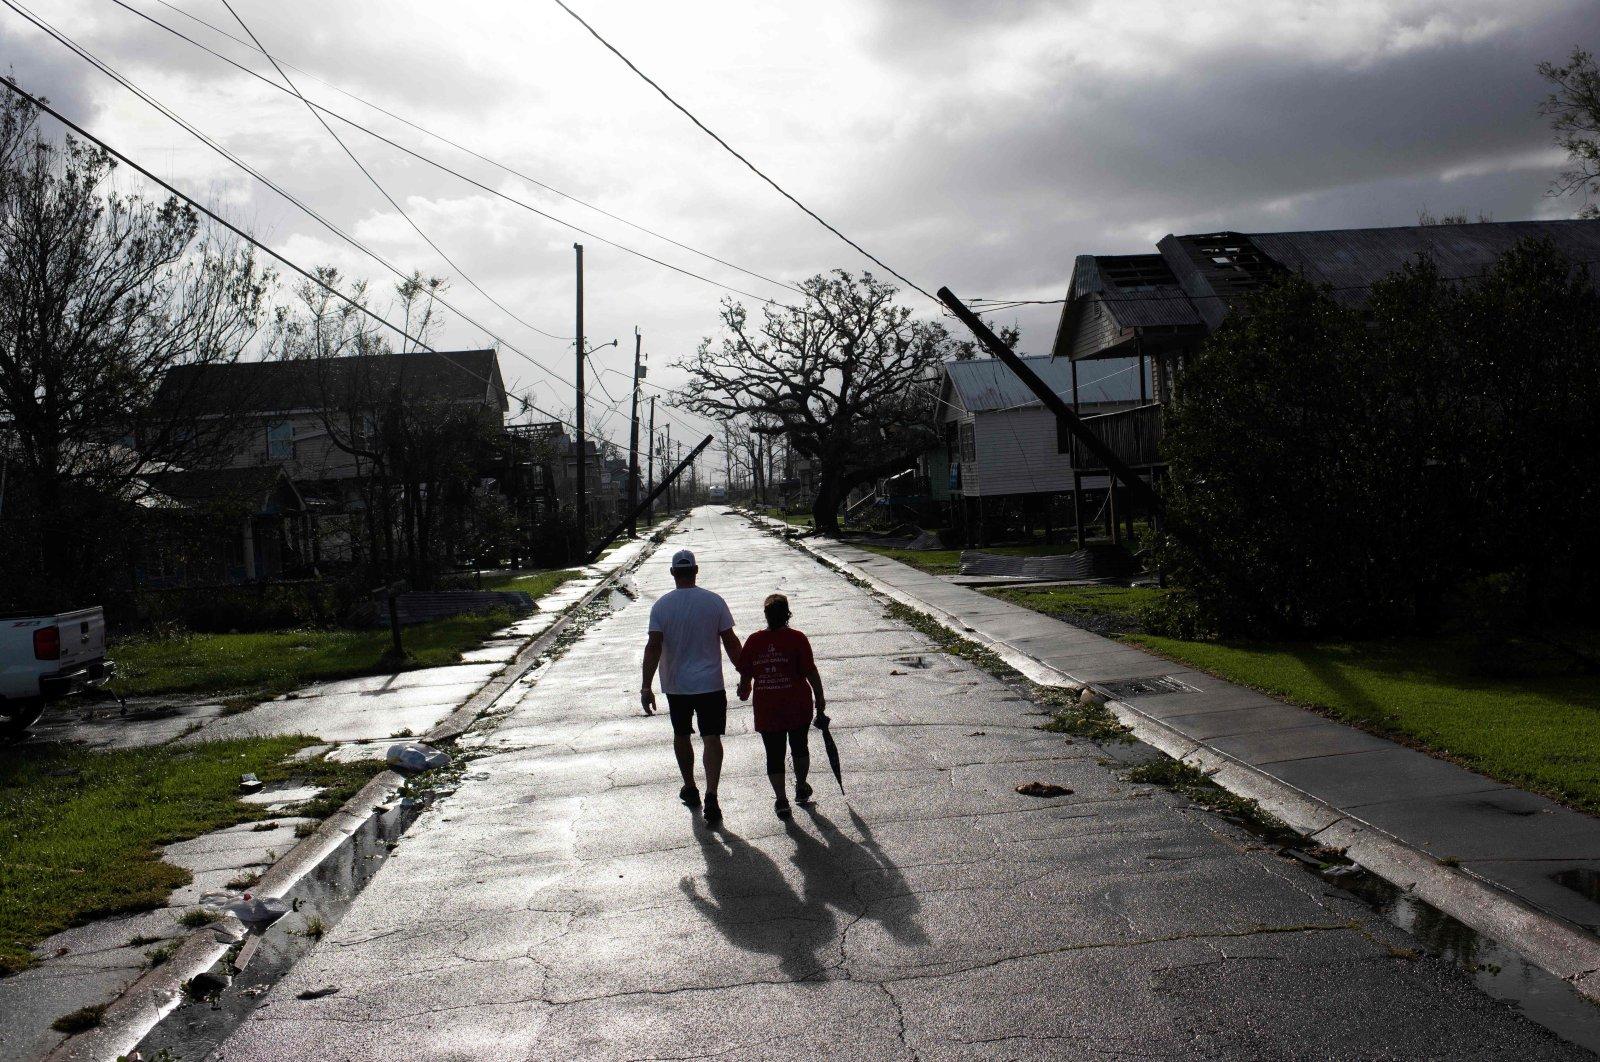 A couple walks down the street while holding hands after Hurricane Ida made landfall, Montegut, Louisiana, U.S., Aug. 30, 2021. (AFP Photo)